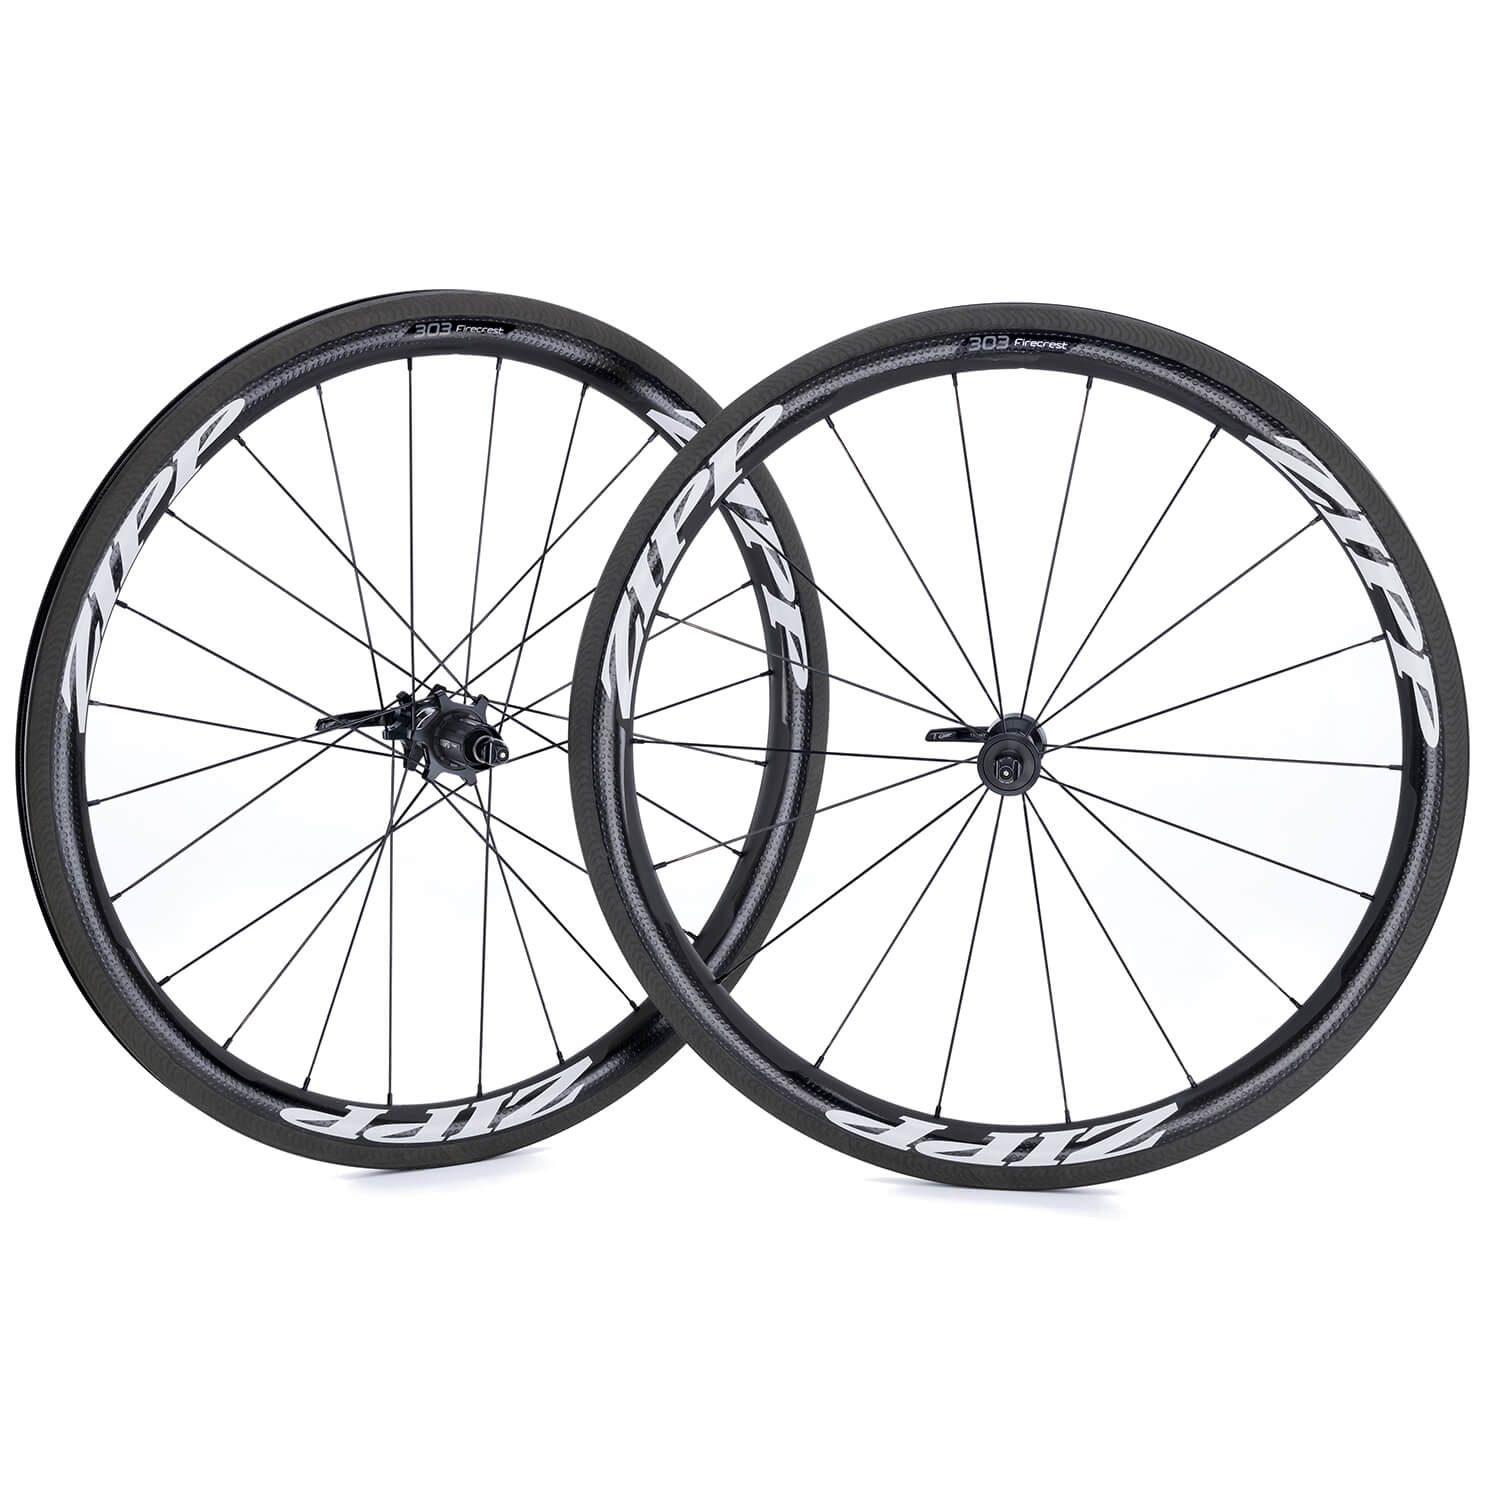 052501c08b3 Zipp 303 Firecrest Carbon Clincher Wheelset 2019 - White - Shimano SRAM